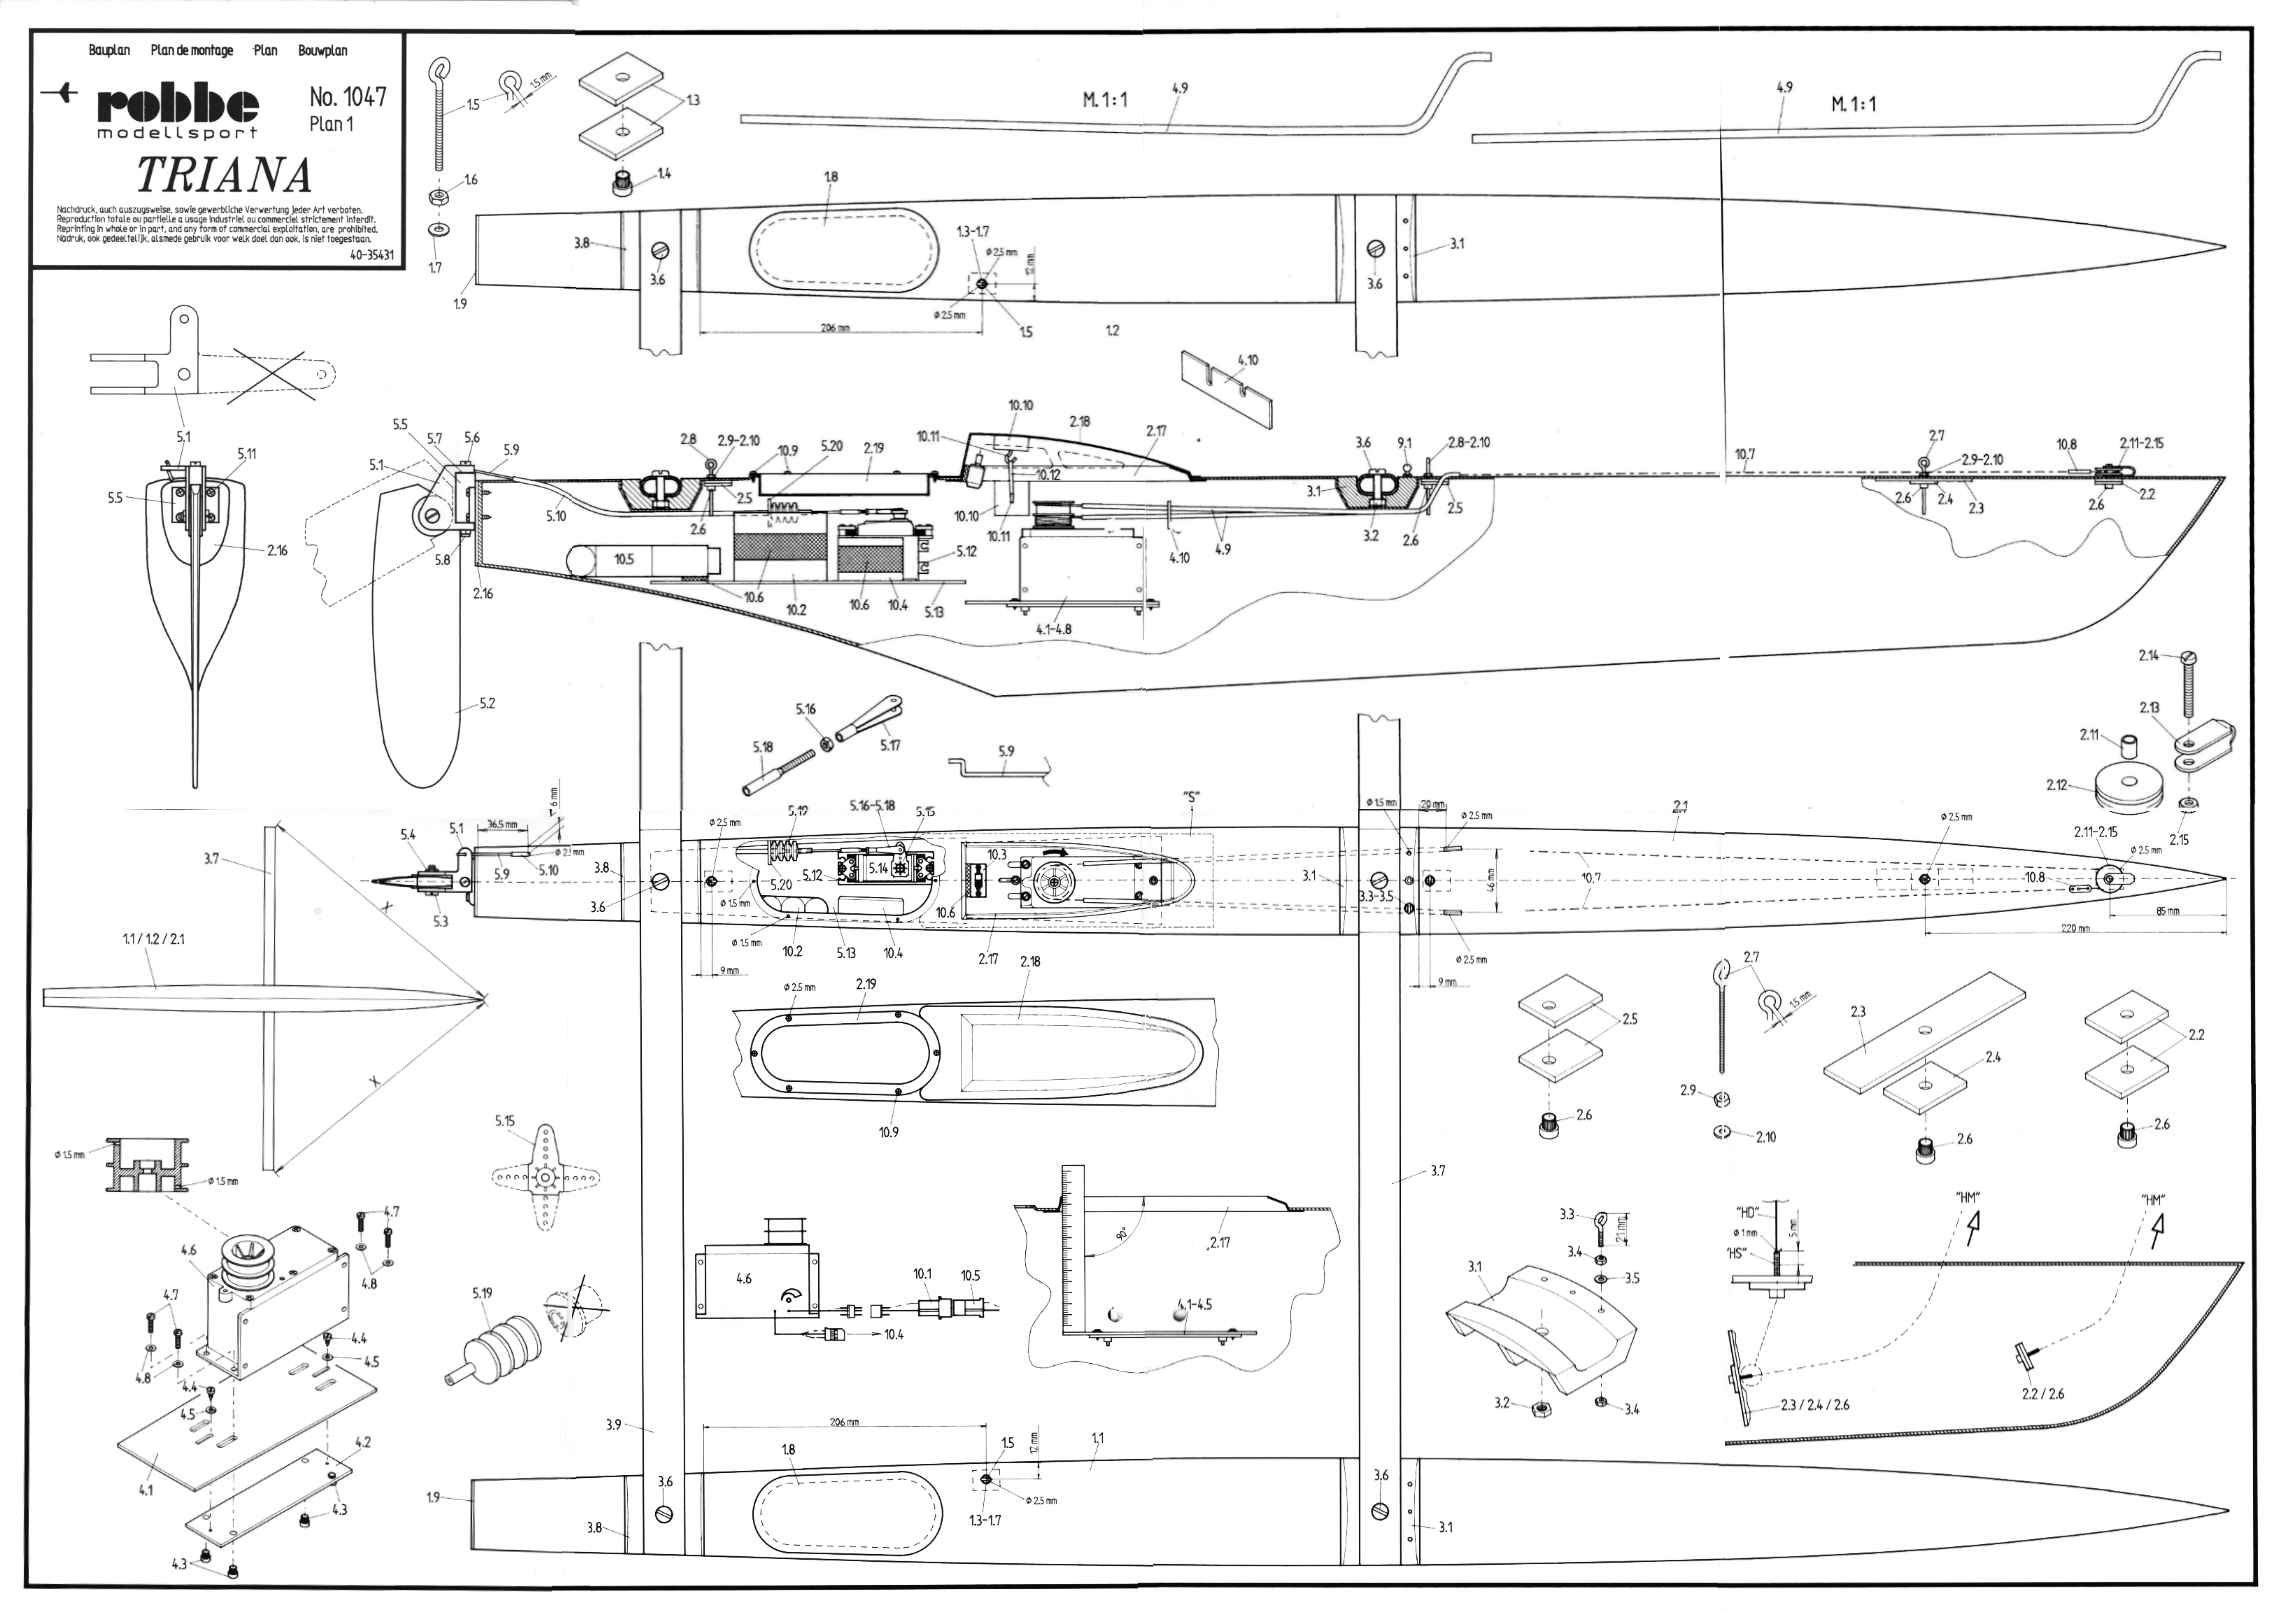 hight resolution of power catamaran rc boat building plans